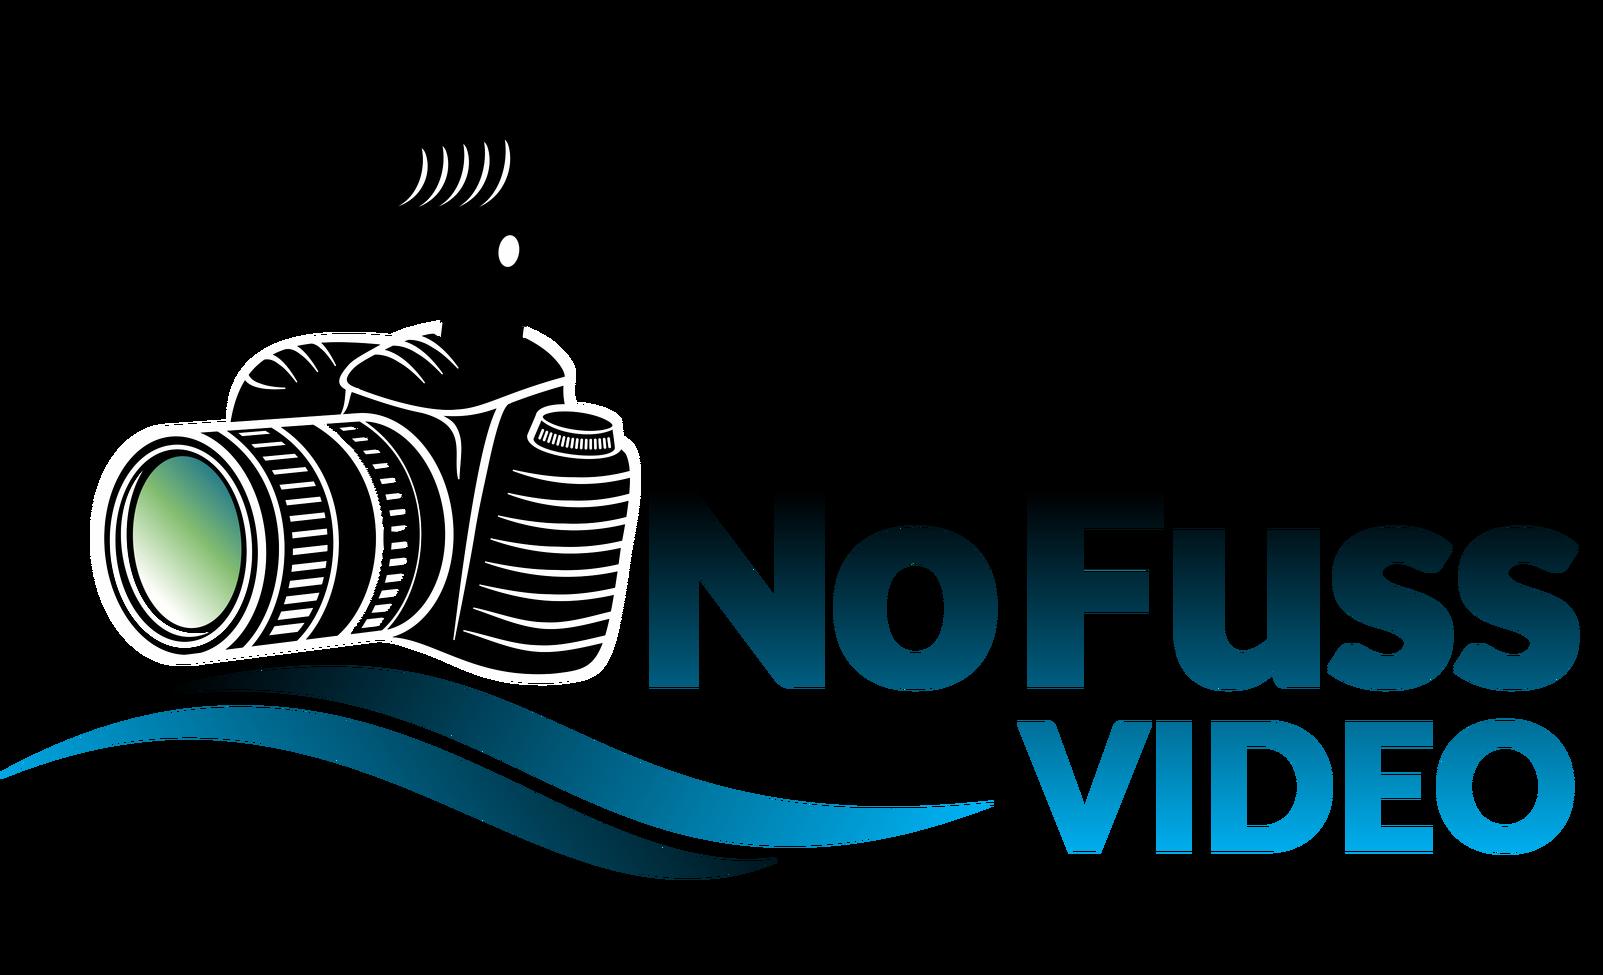 No Fuss Video